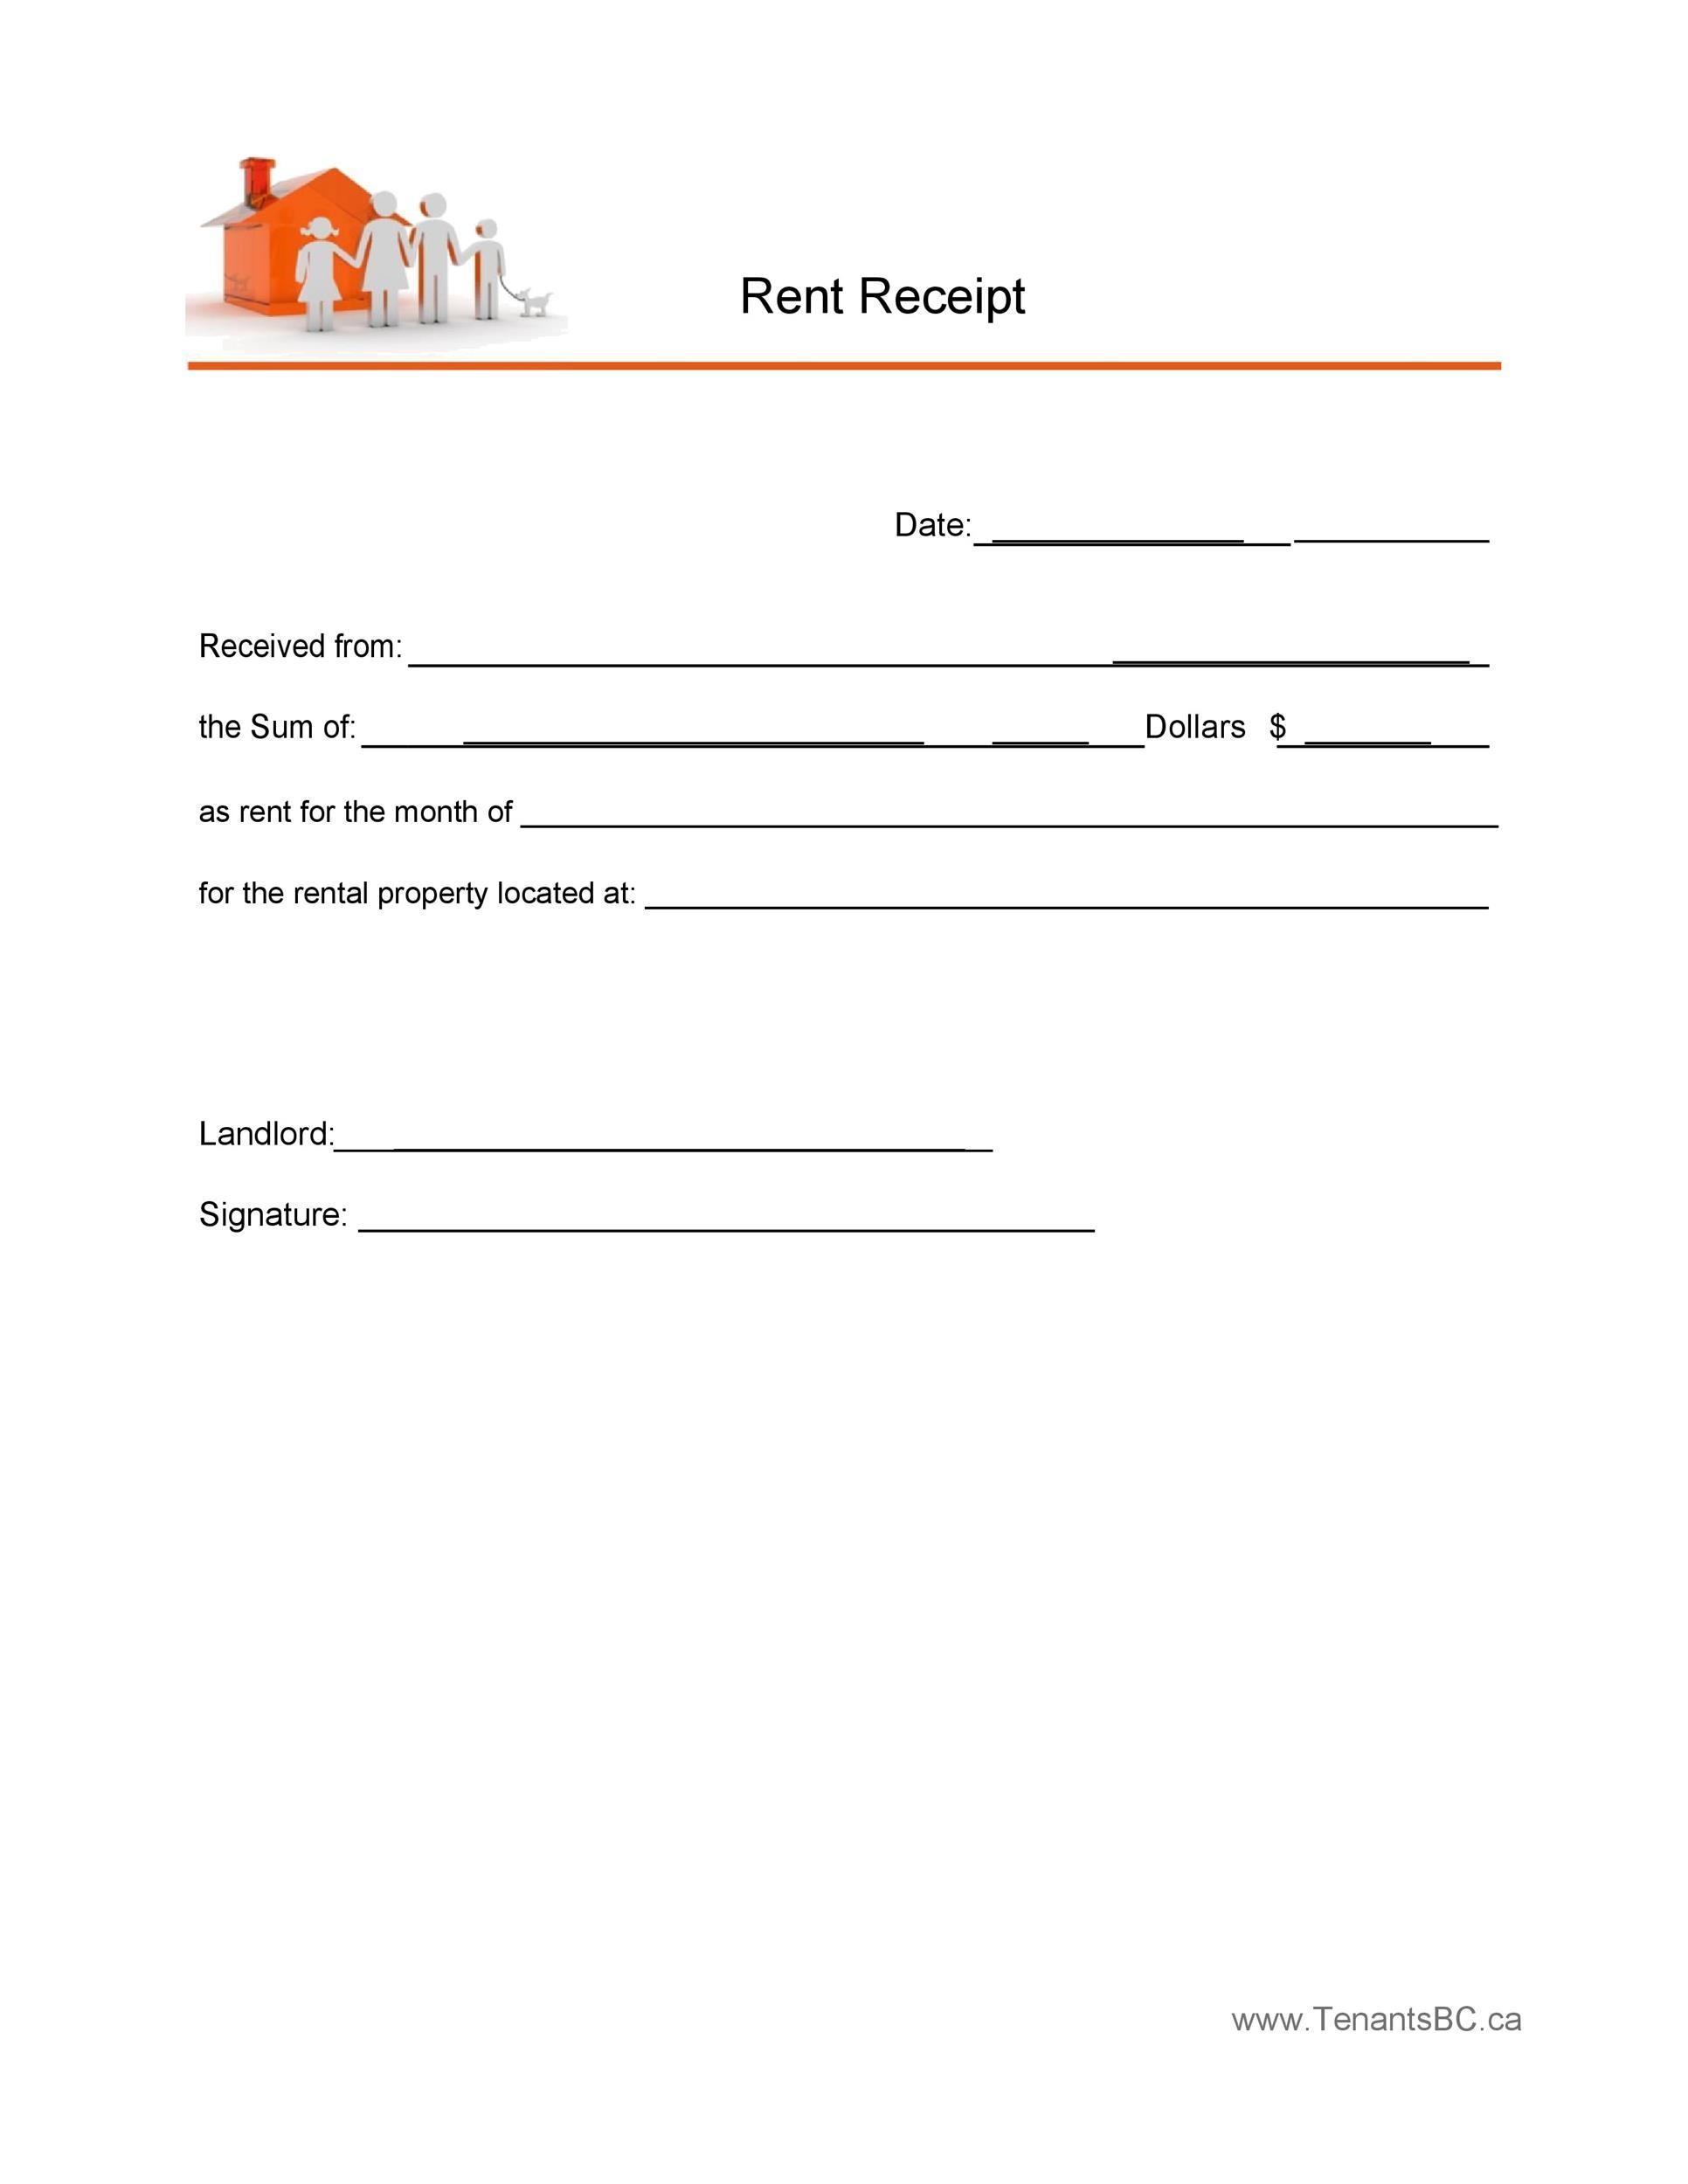 Free rent receipt 10